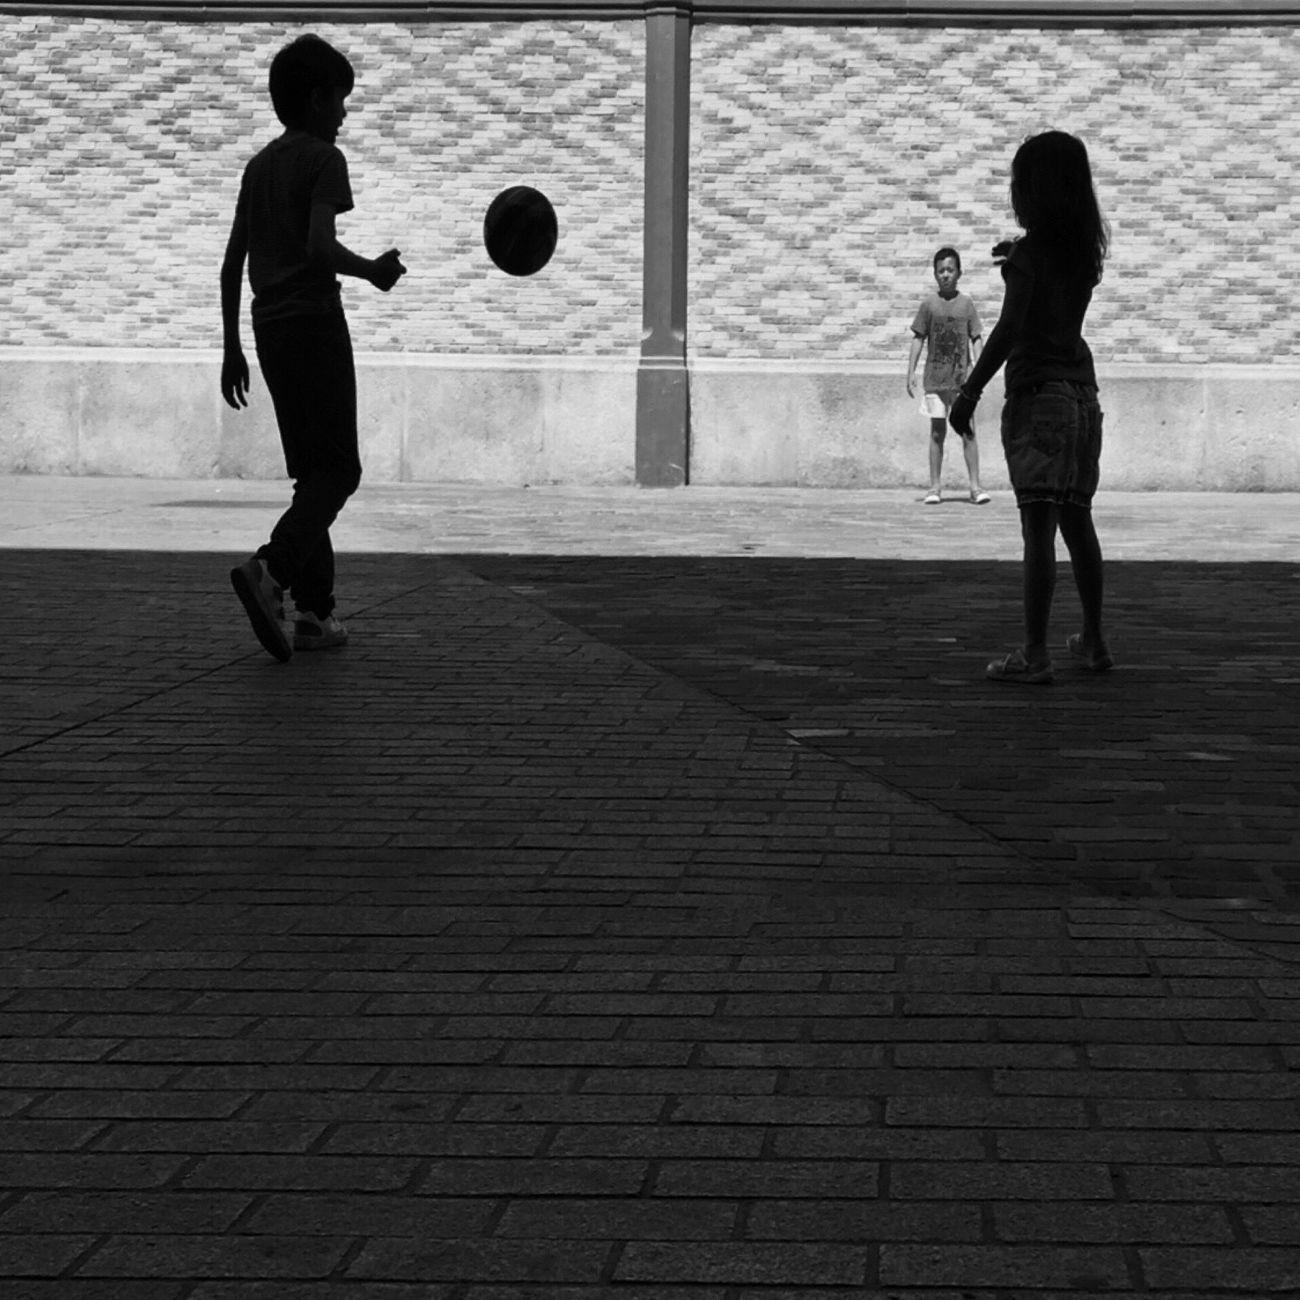 Playing Streetphotography NEM Street Fipaopen NEM GoodKarma NEM Black&white Bw_collection Grryo All_shots Shootermag Growing Better